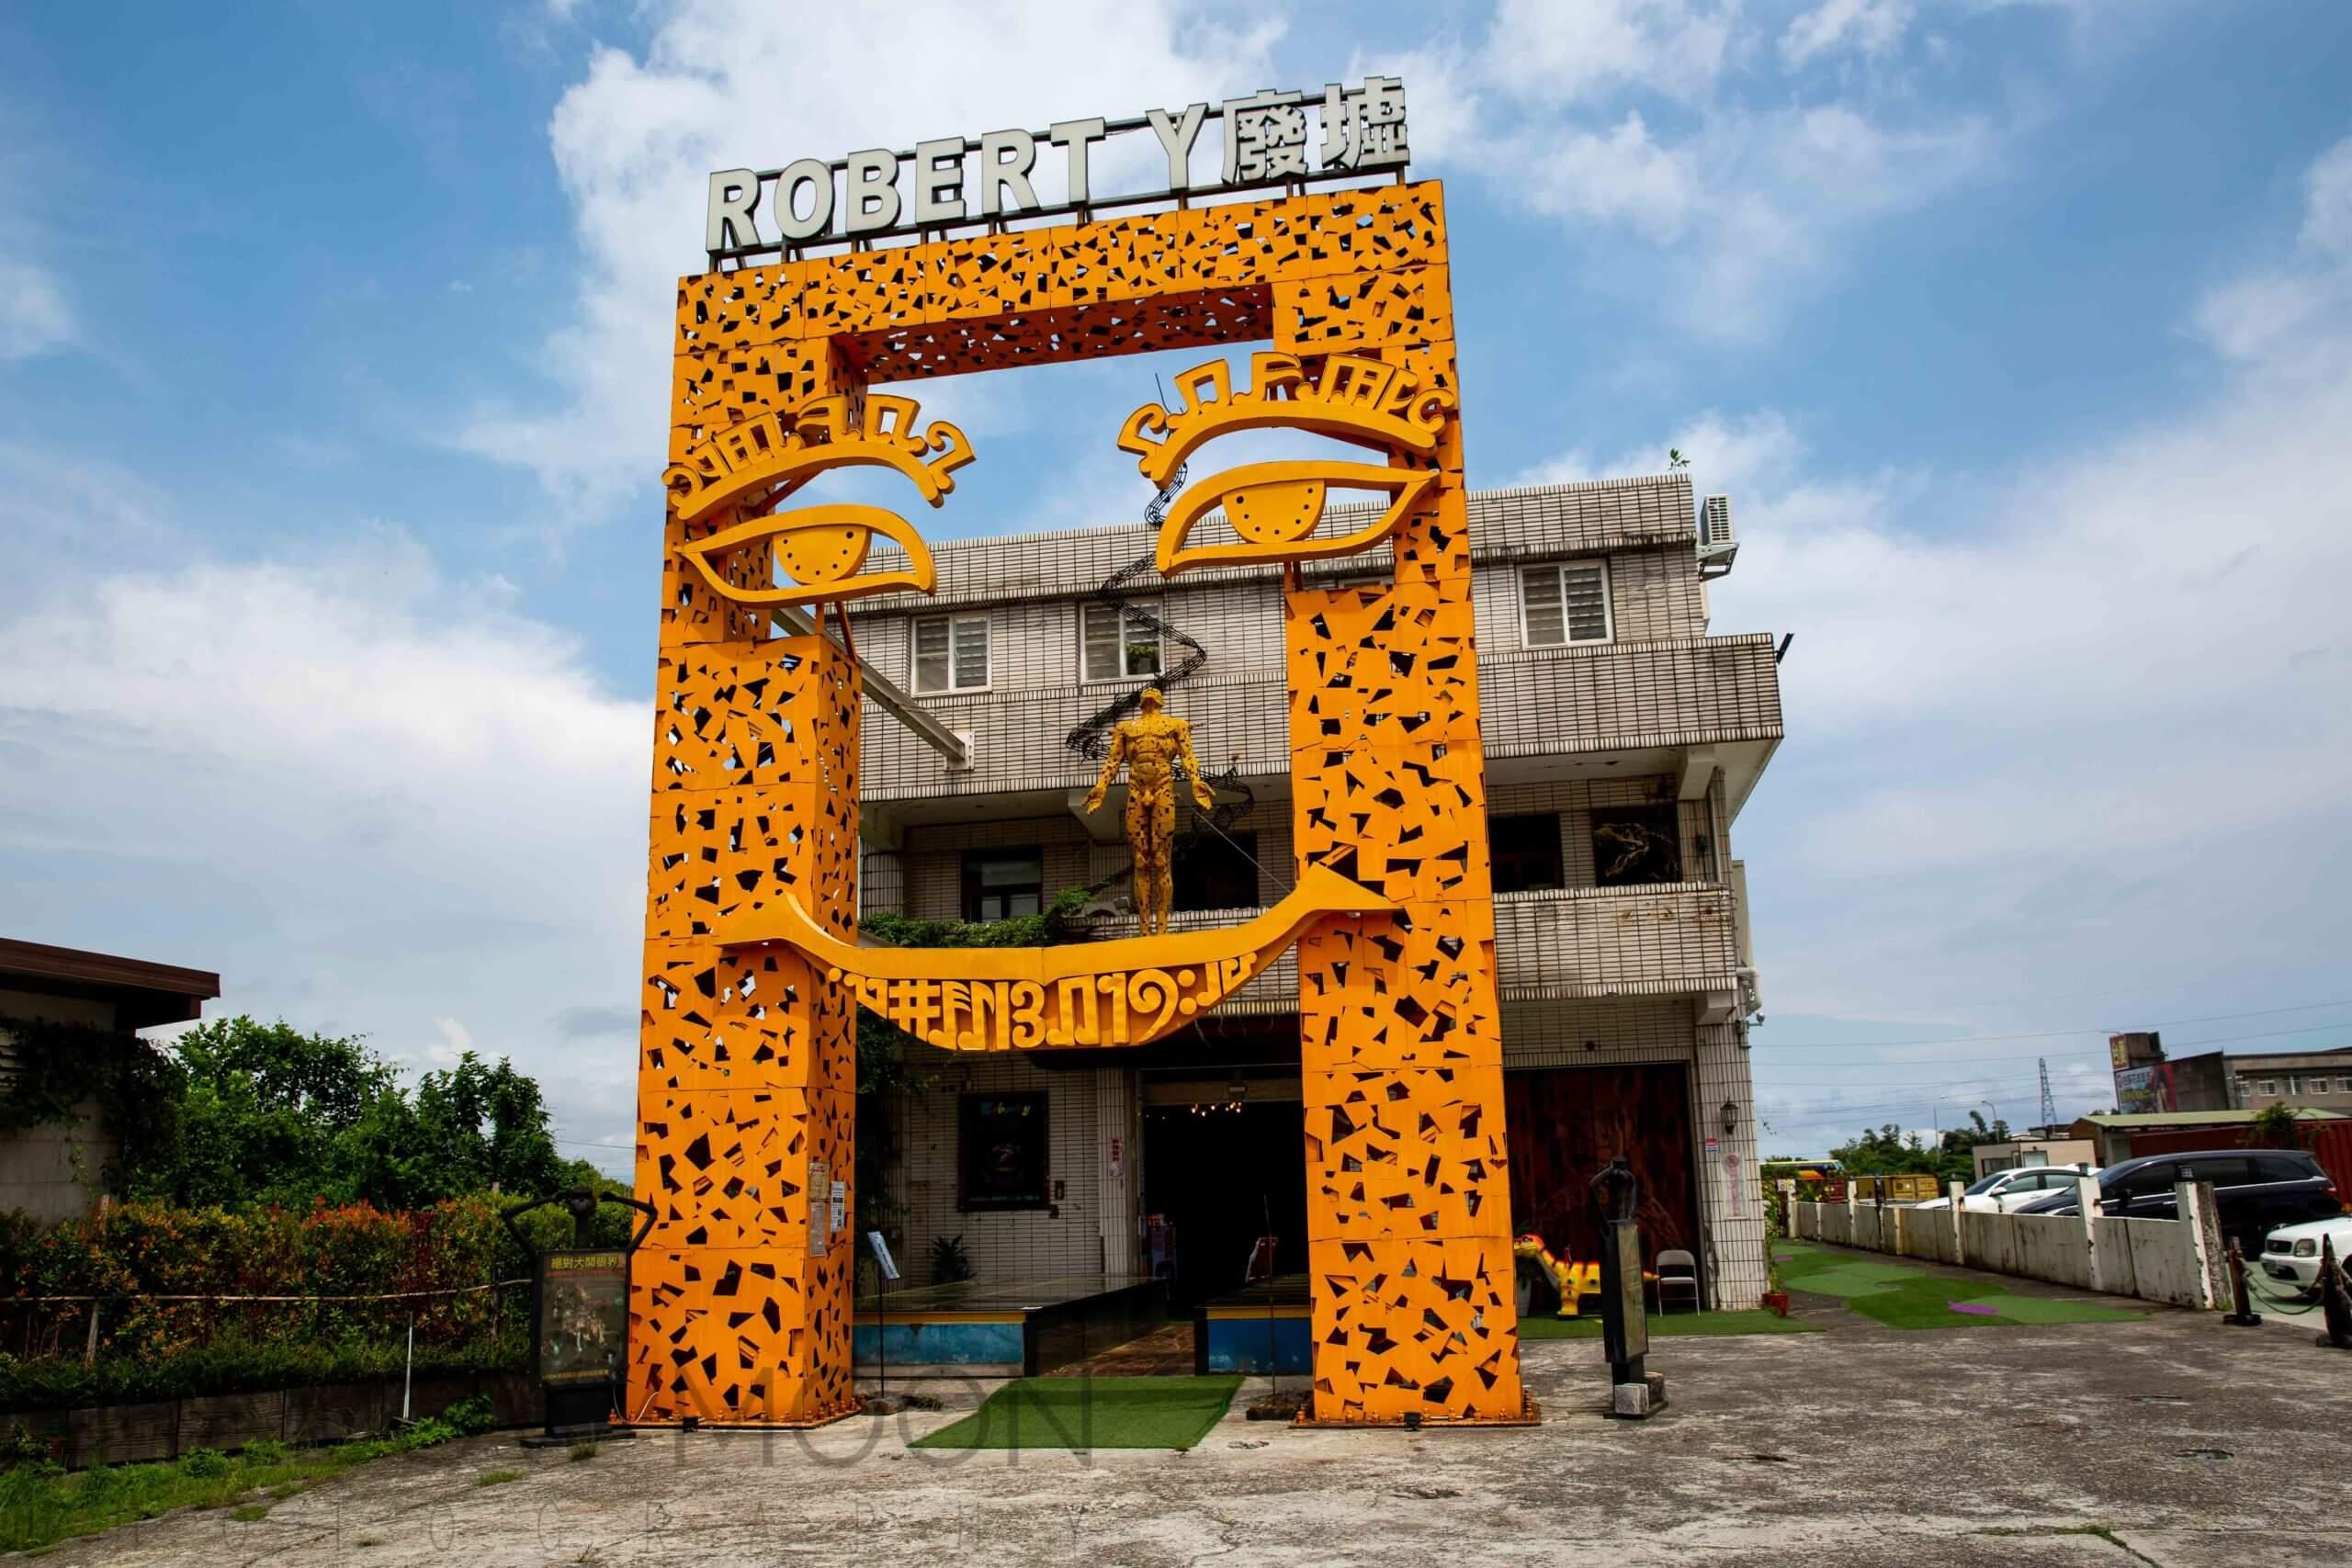 ROBERT Y 廢墟|台灣也有暴龍化石-世界僅8具,宜蘭私人博物館-暴龍化石完整度85%世界第二